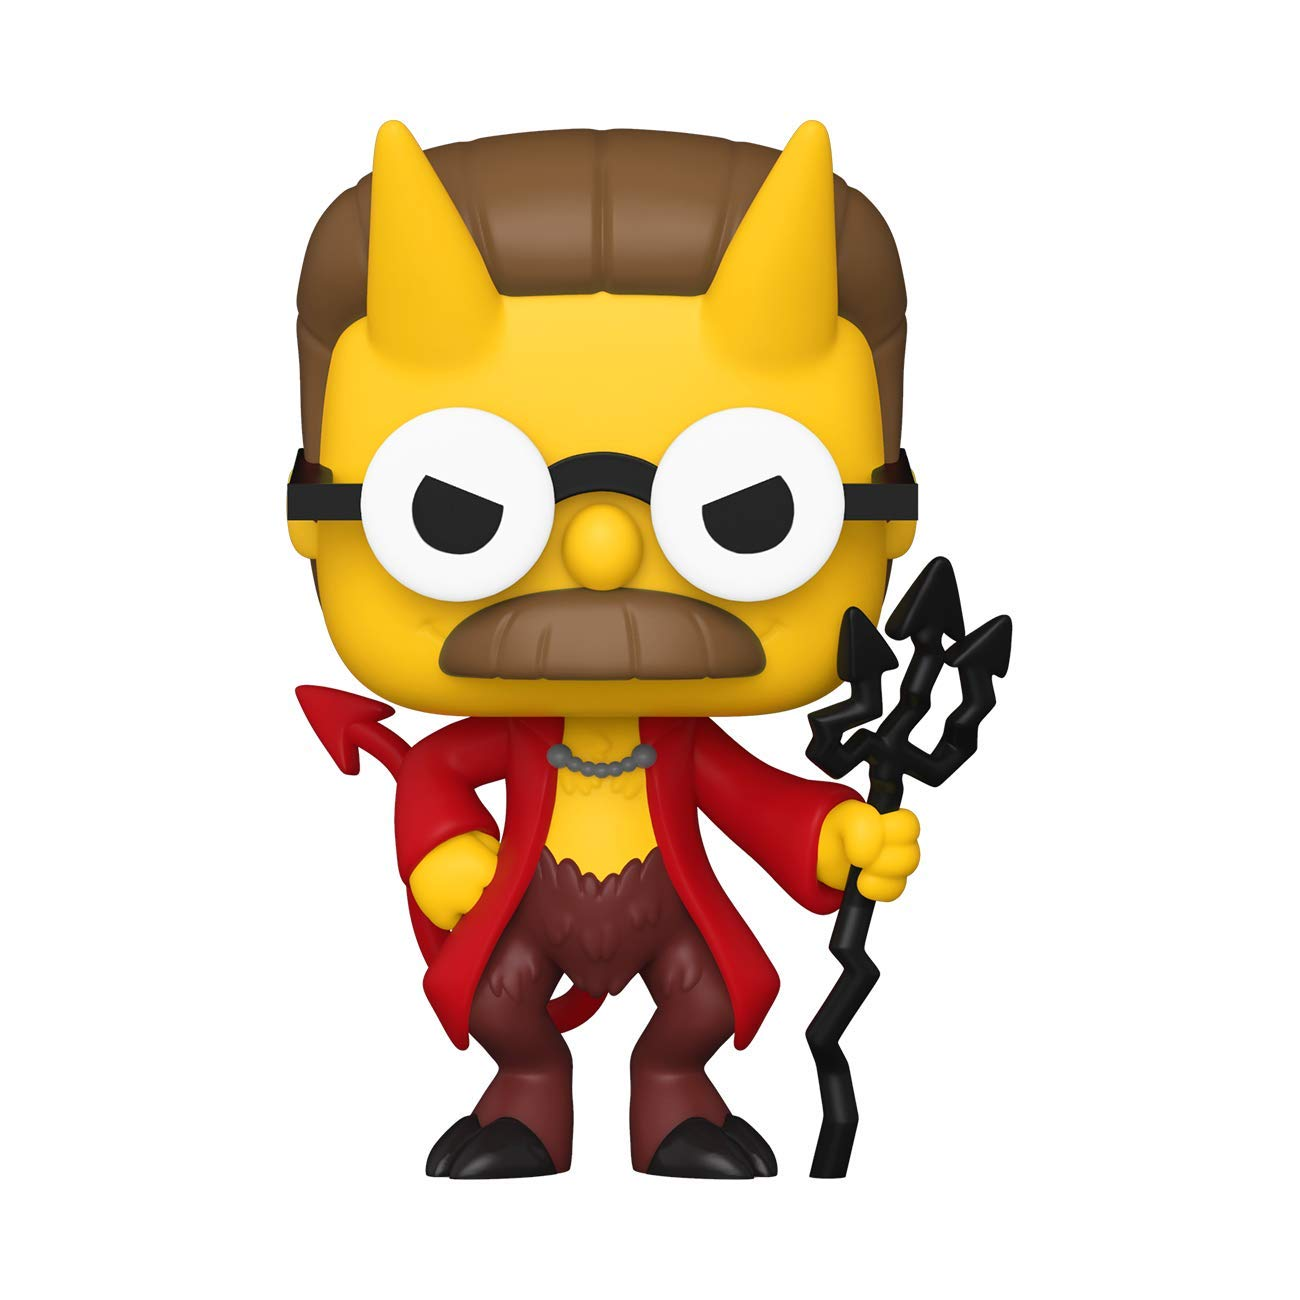 Funko Pop! Animation: Simpsons - Devil Flanders, Multicolour